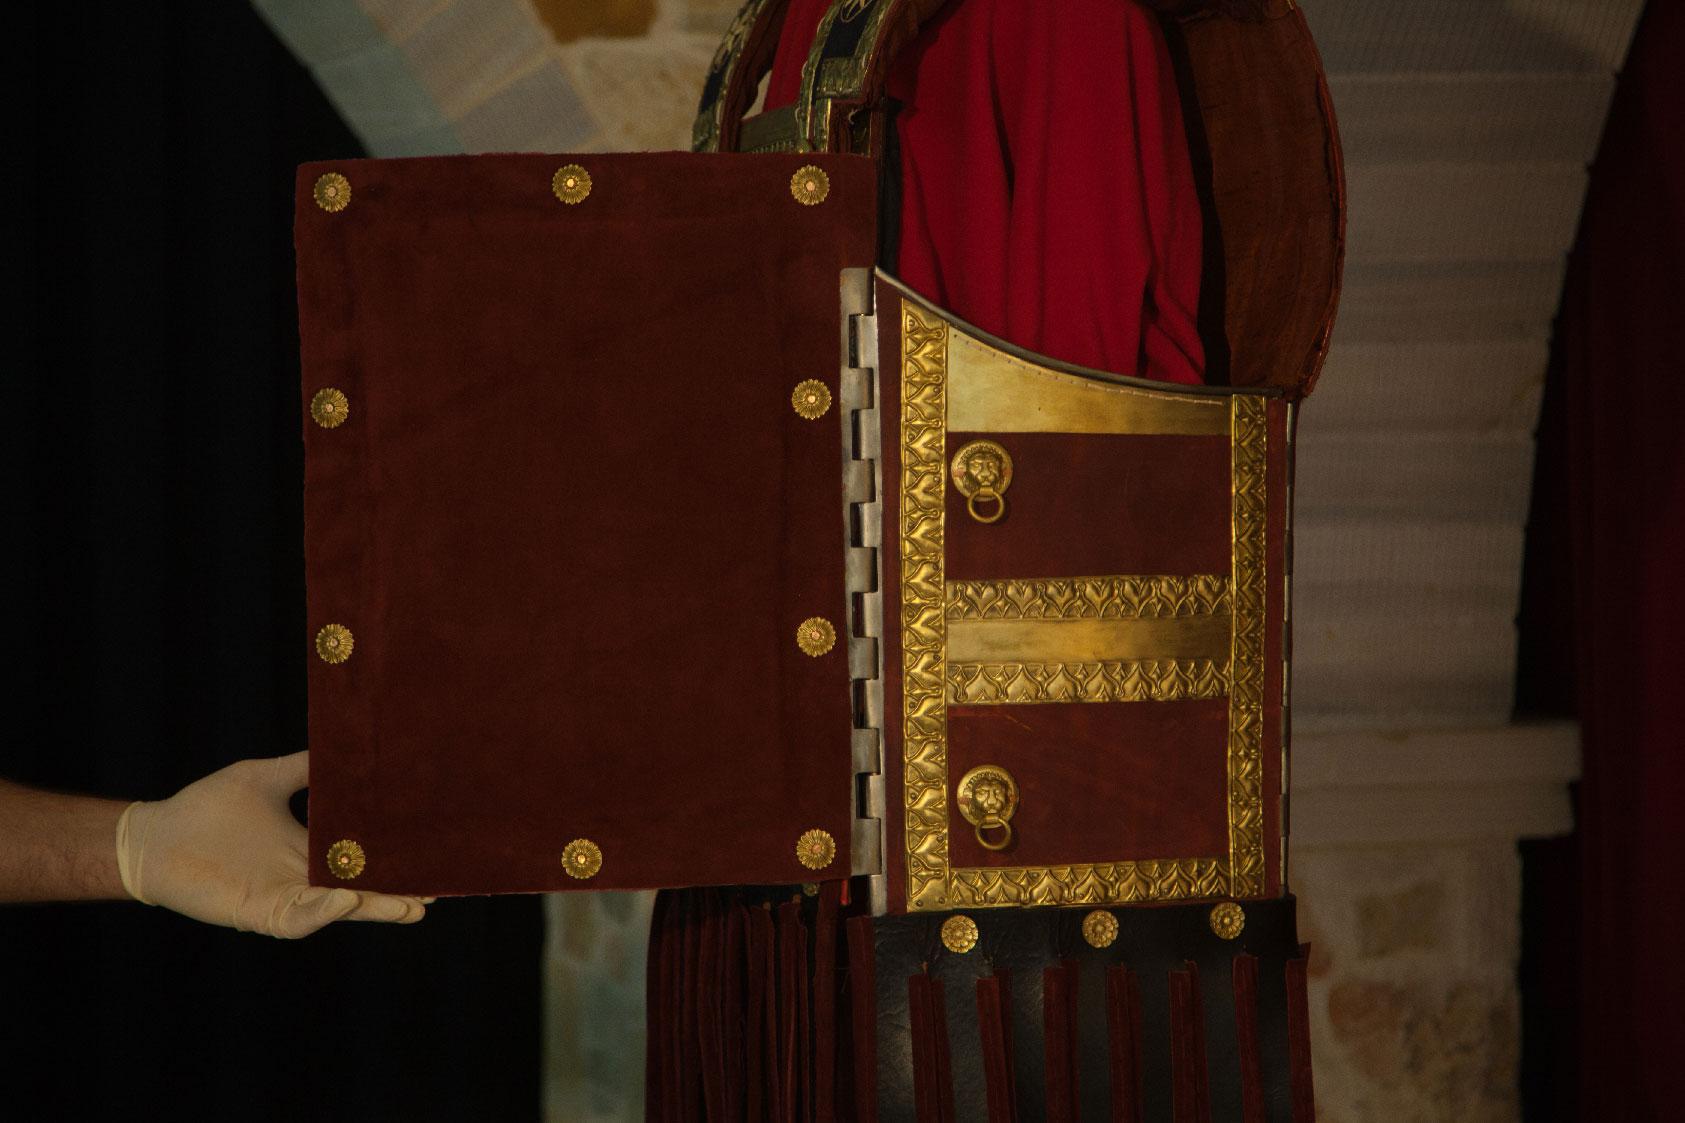 Cuirass of Phillip II of Macedon